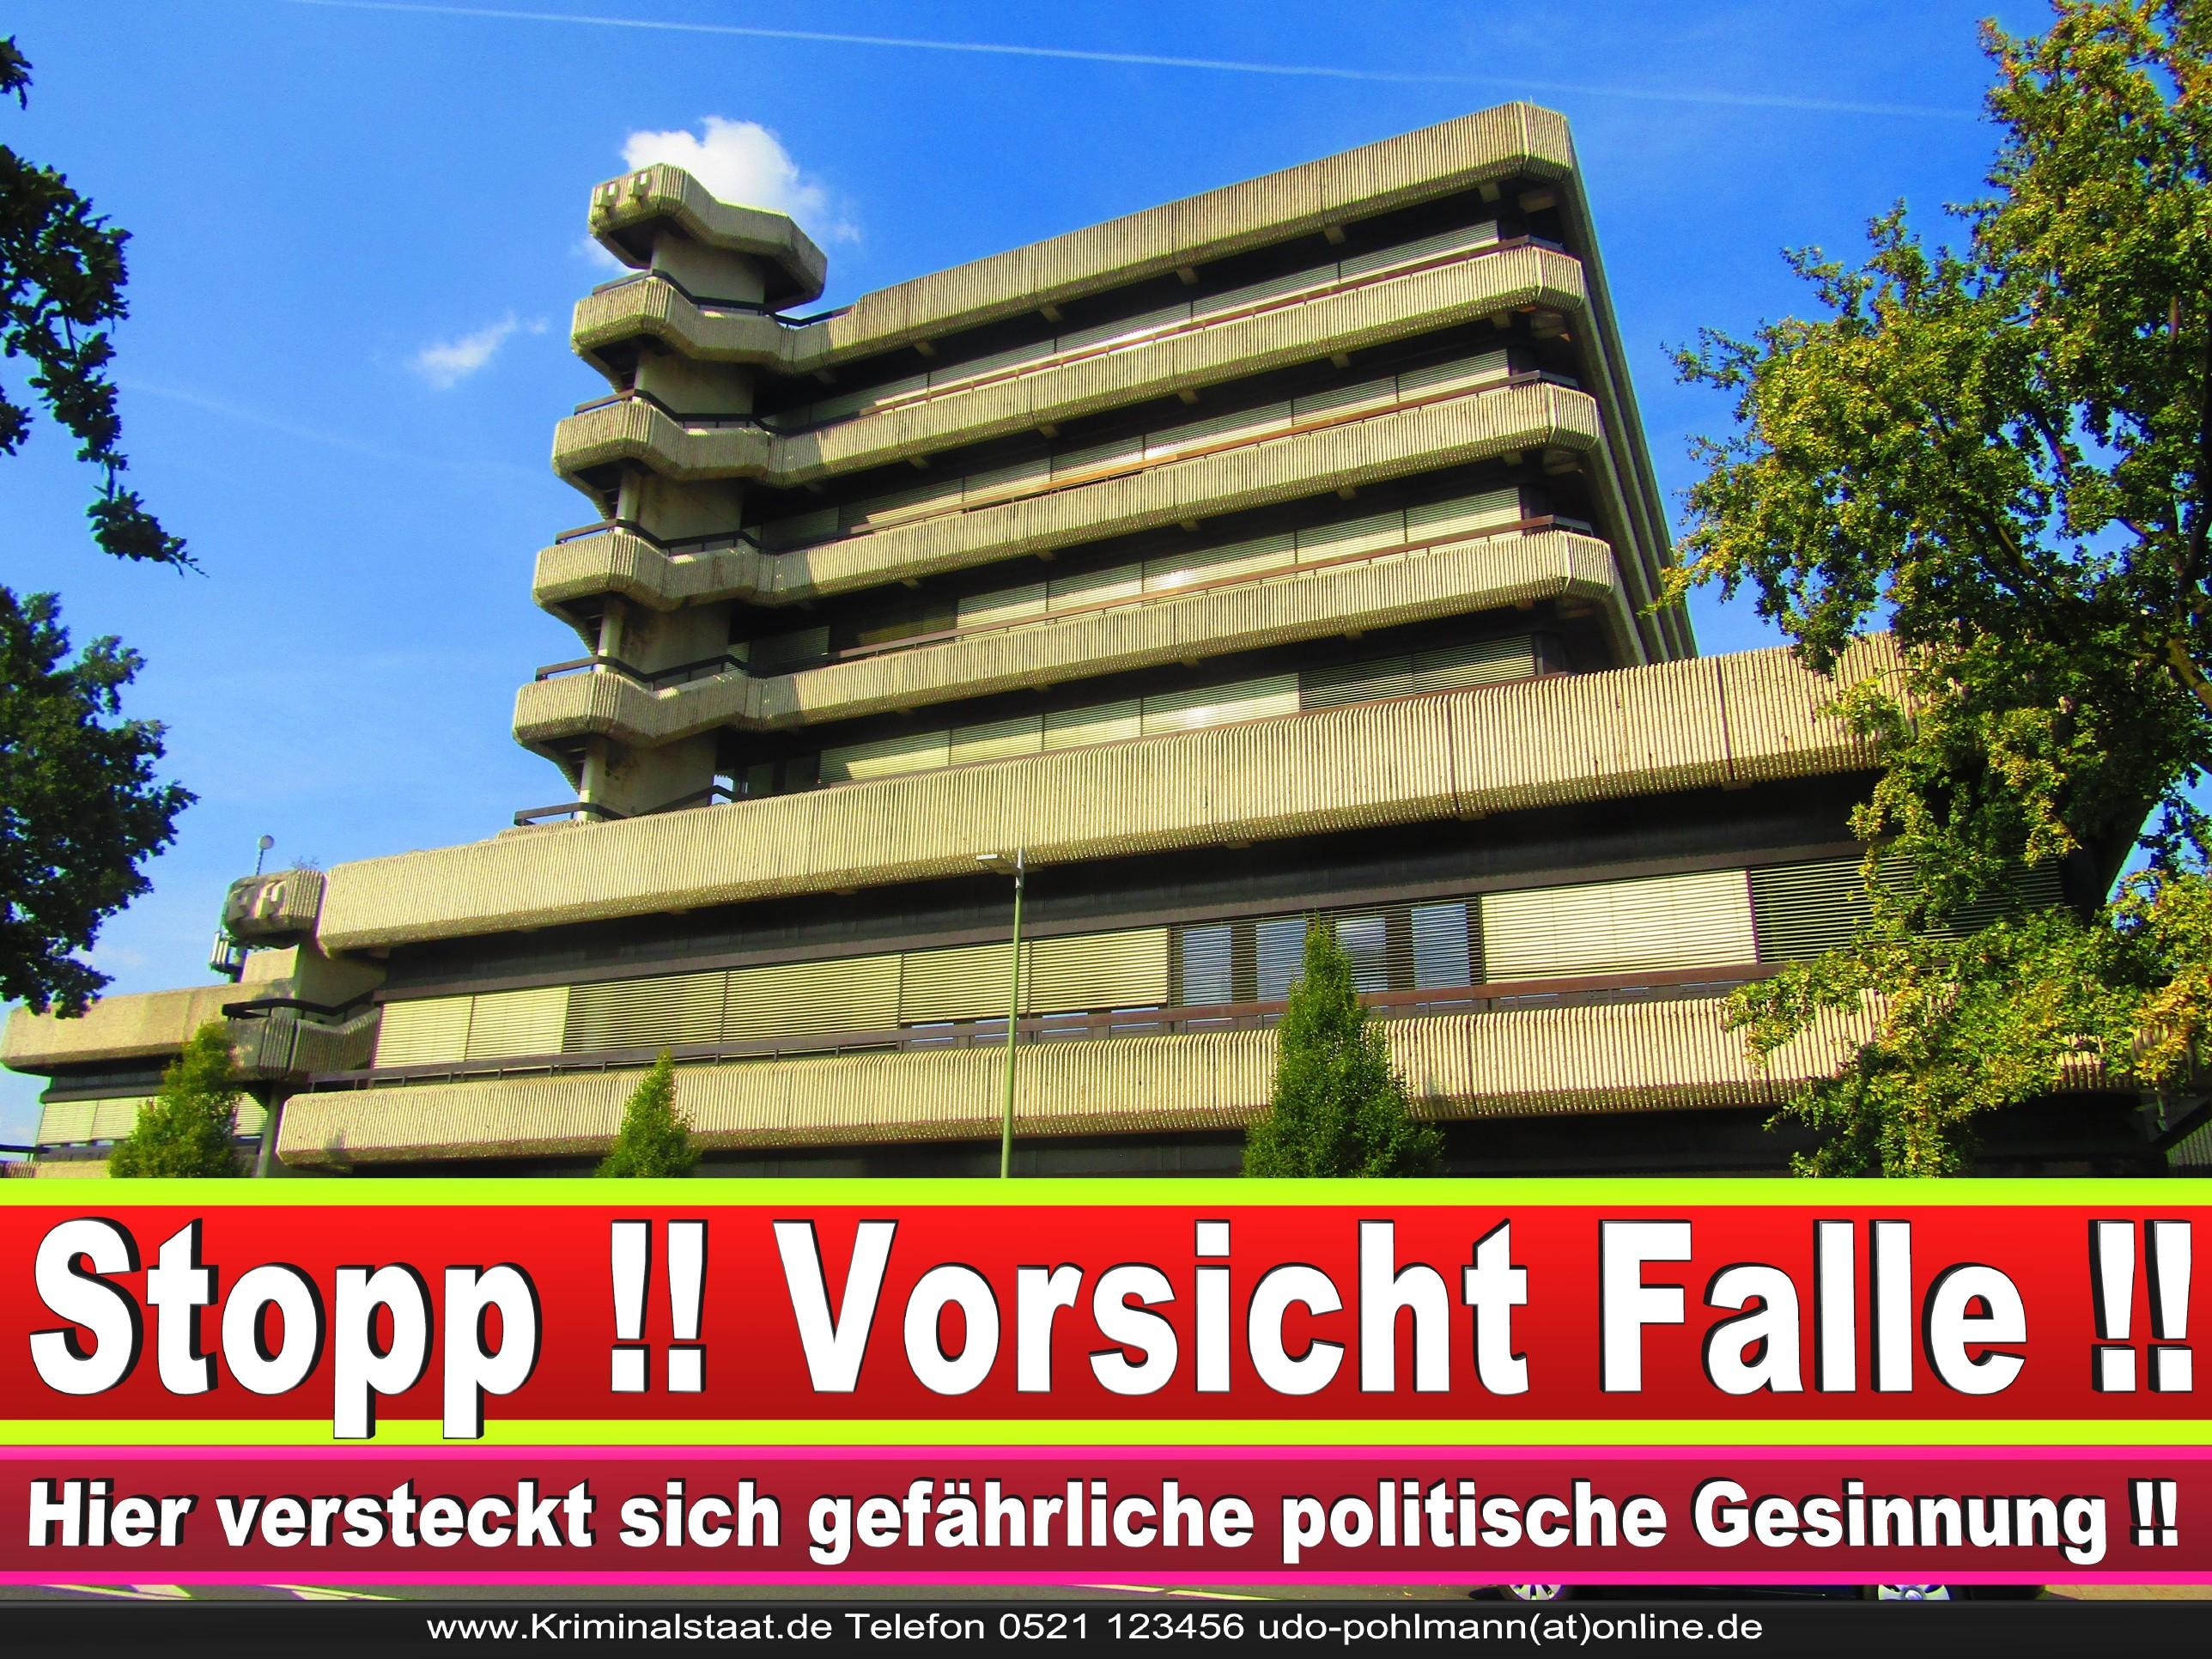 SPARKASSE BIELEFELD ANDREAS RÜTHER CDU BIELEFELD 2 LANDTAGSWAHL BUNDESTAGSWAHL BÜRGERMEISTERWAHL